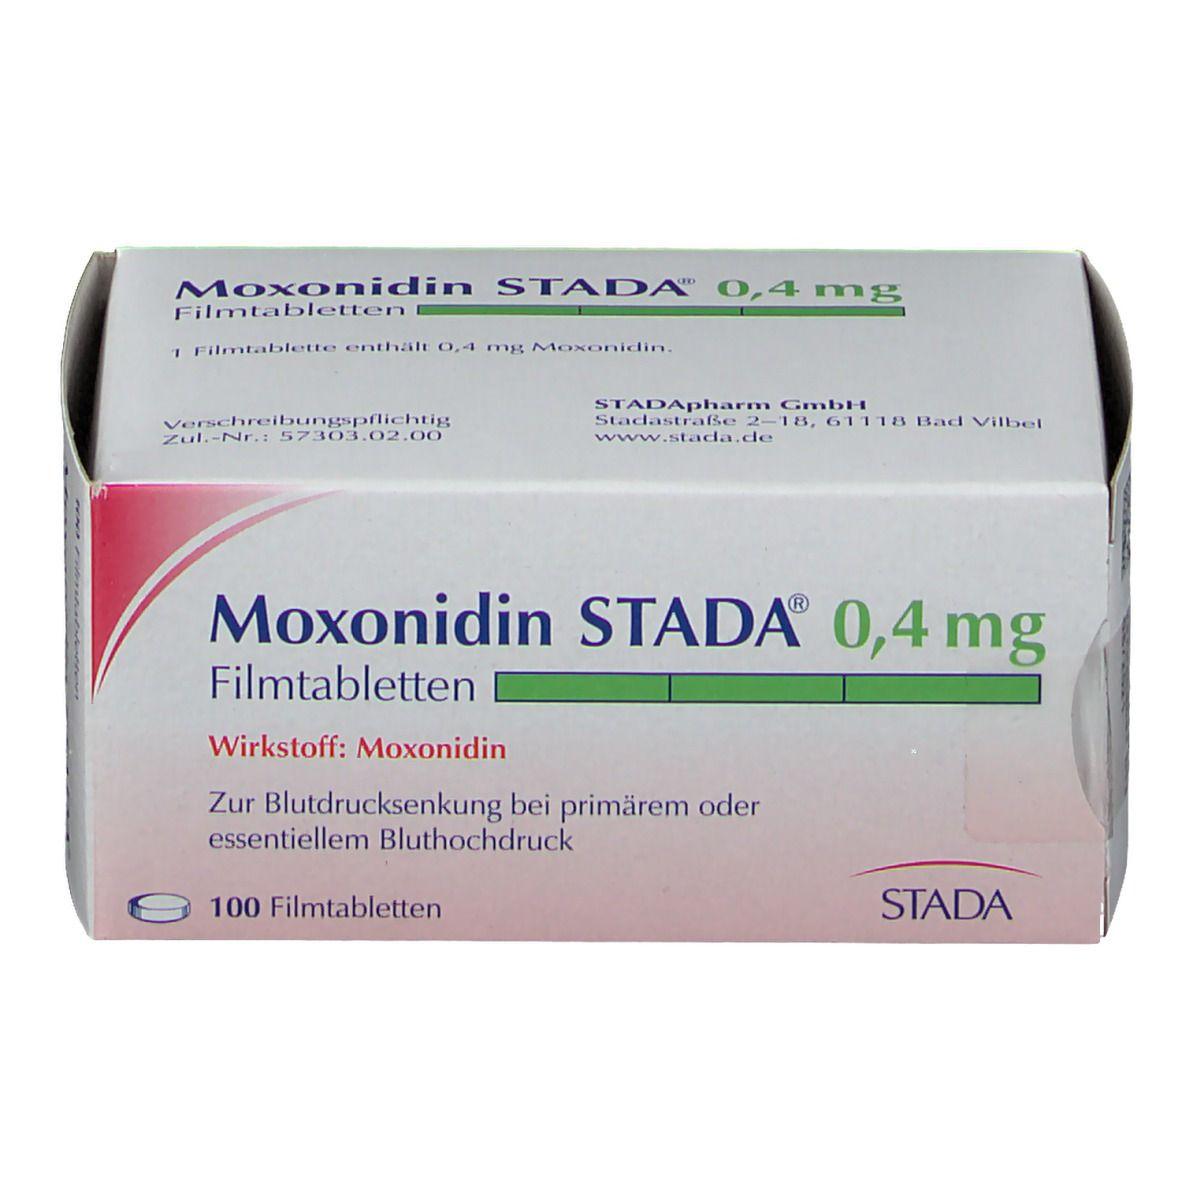 Moxonidin Stada® 0,4 mg Filmtabletten